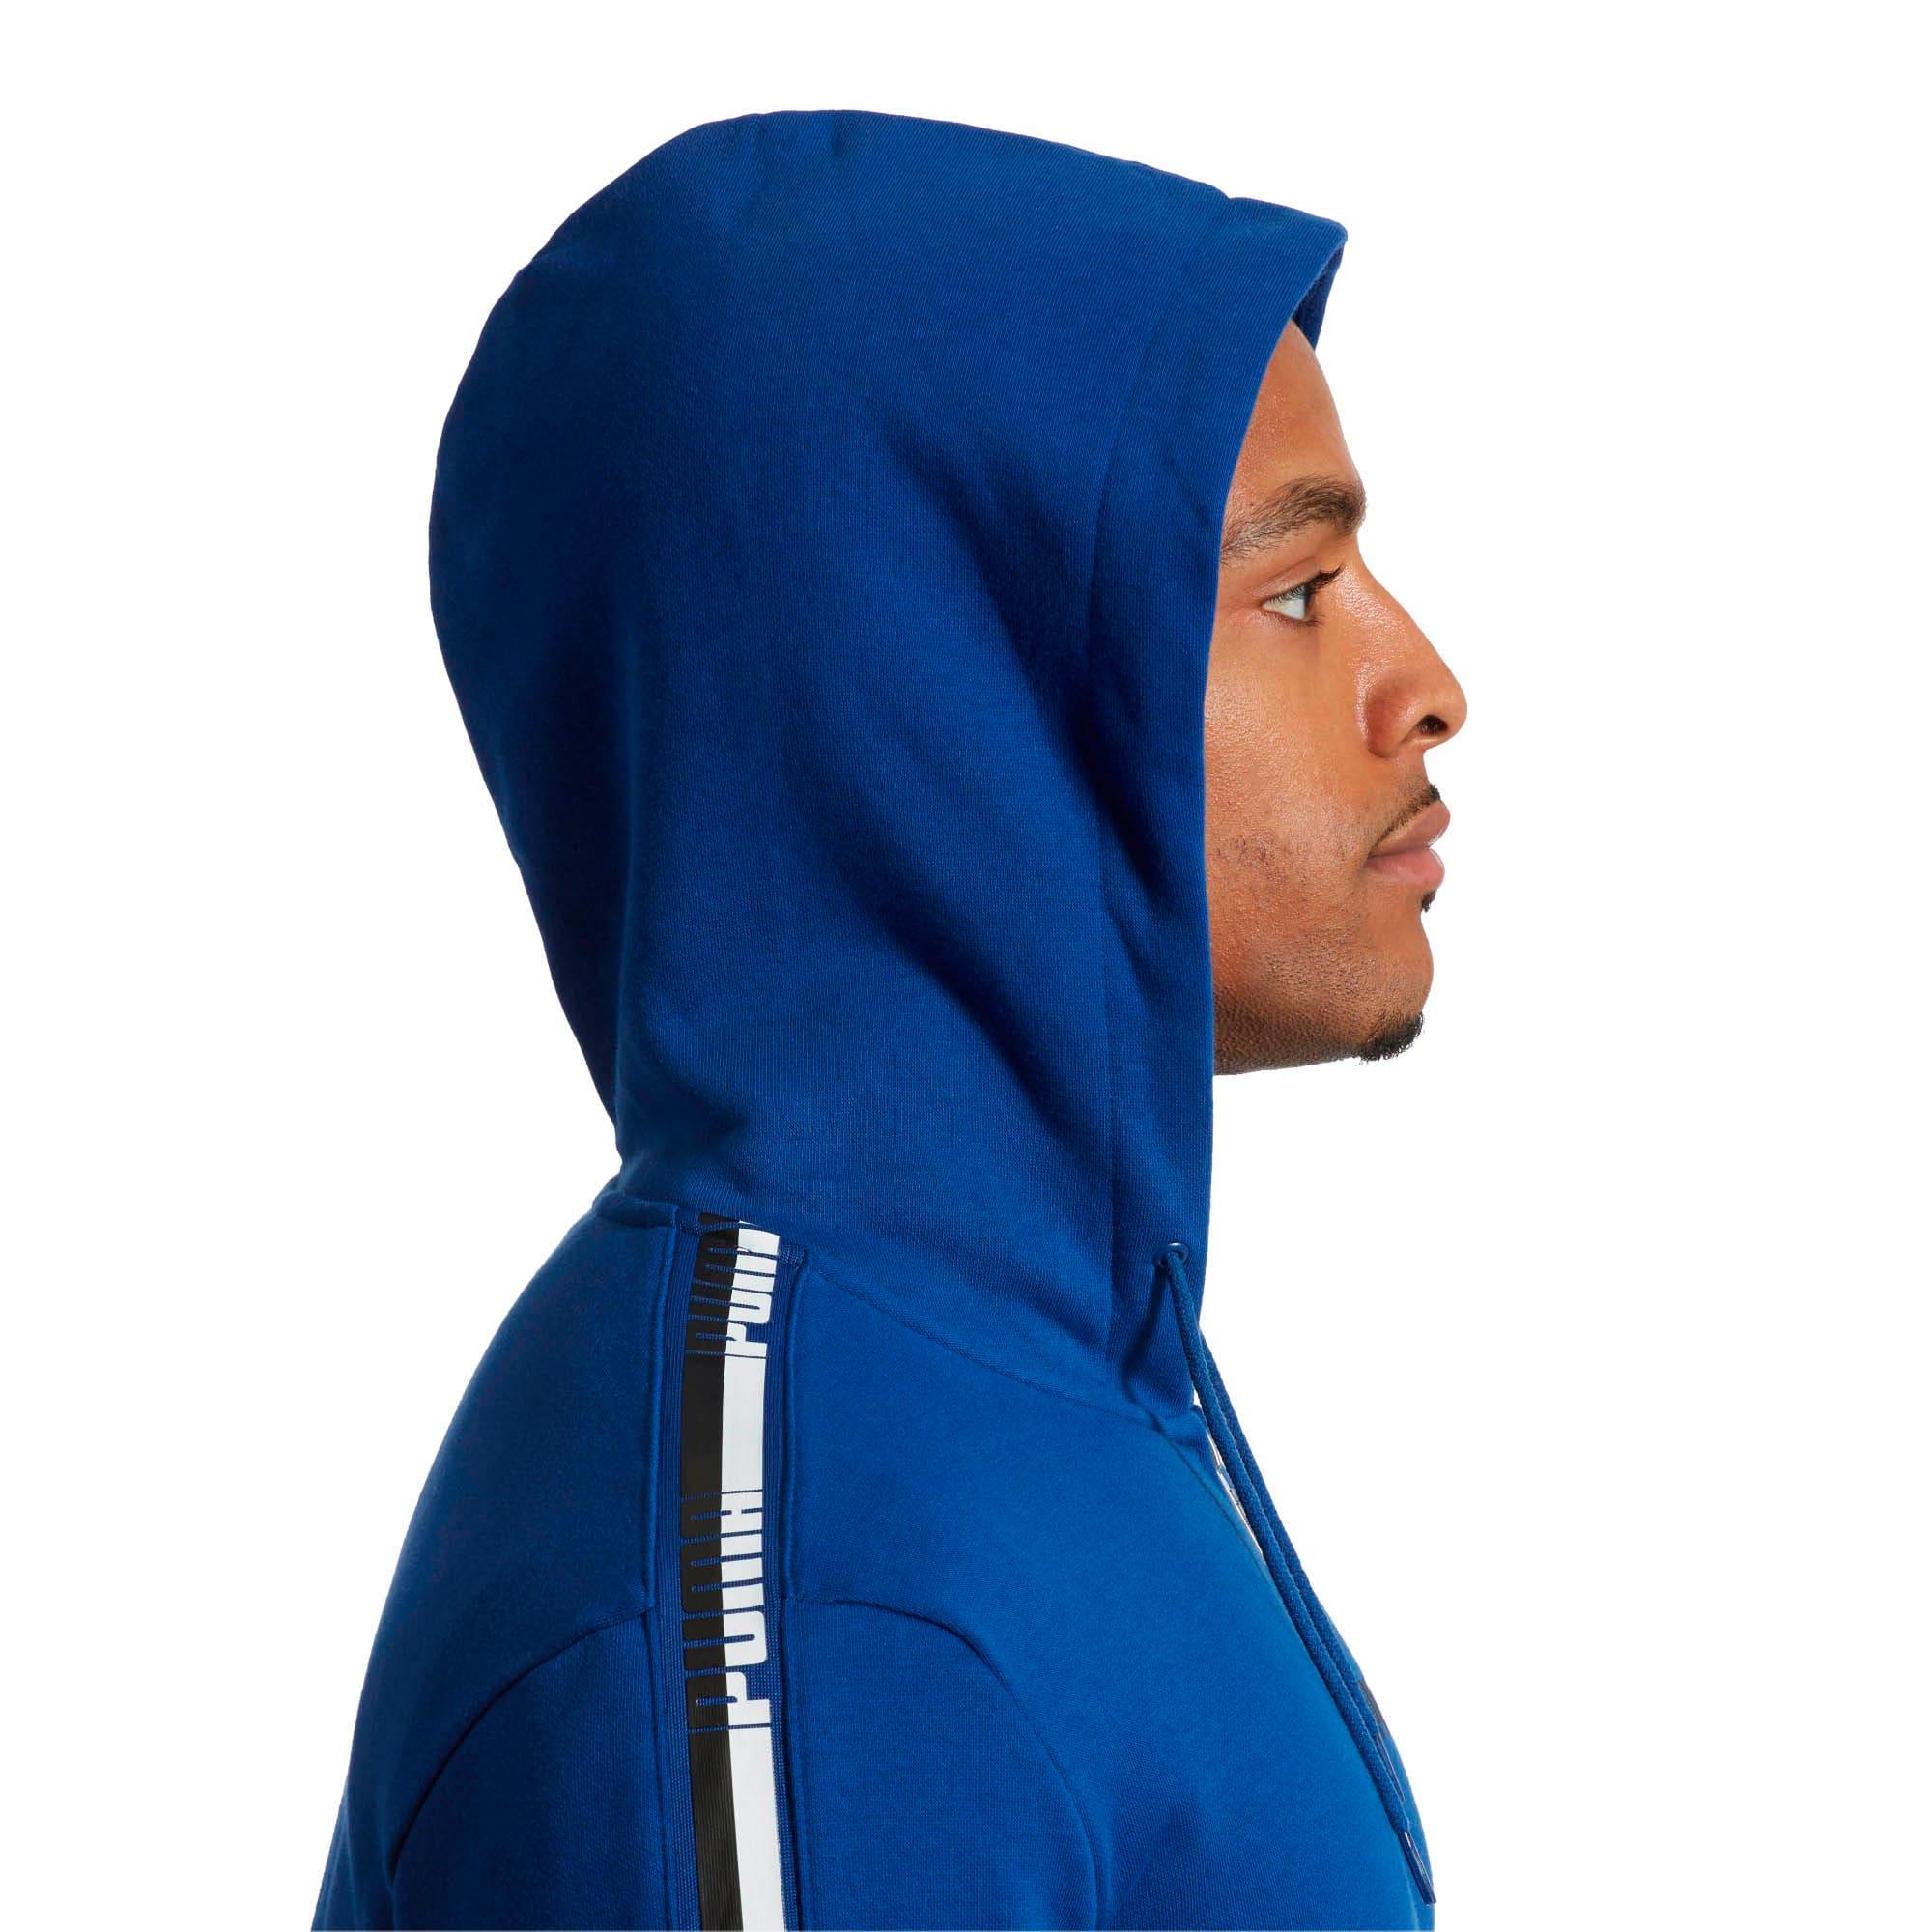 Thumbnail 4 of Men's Tape Full Zip Fleece Hoodie, Sodalite Blue, medium